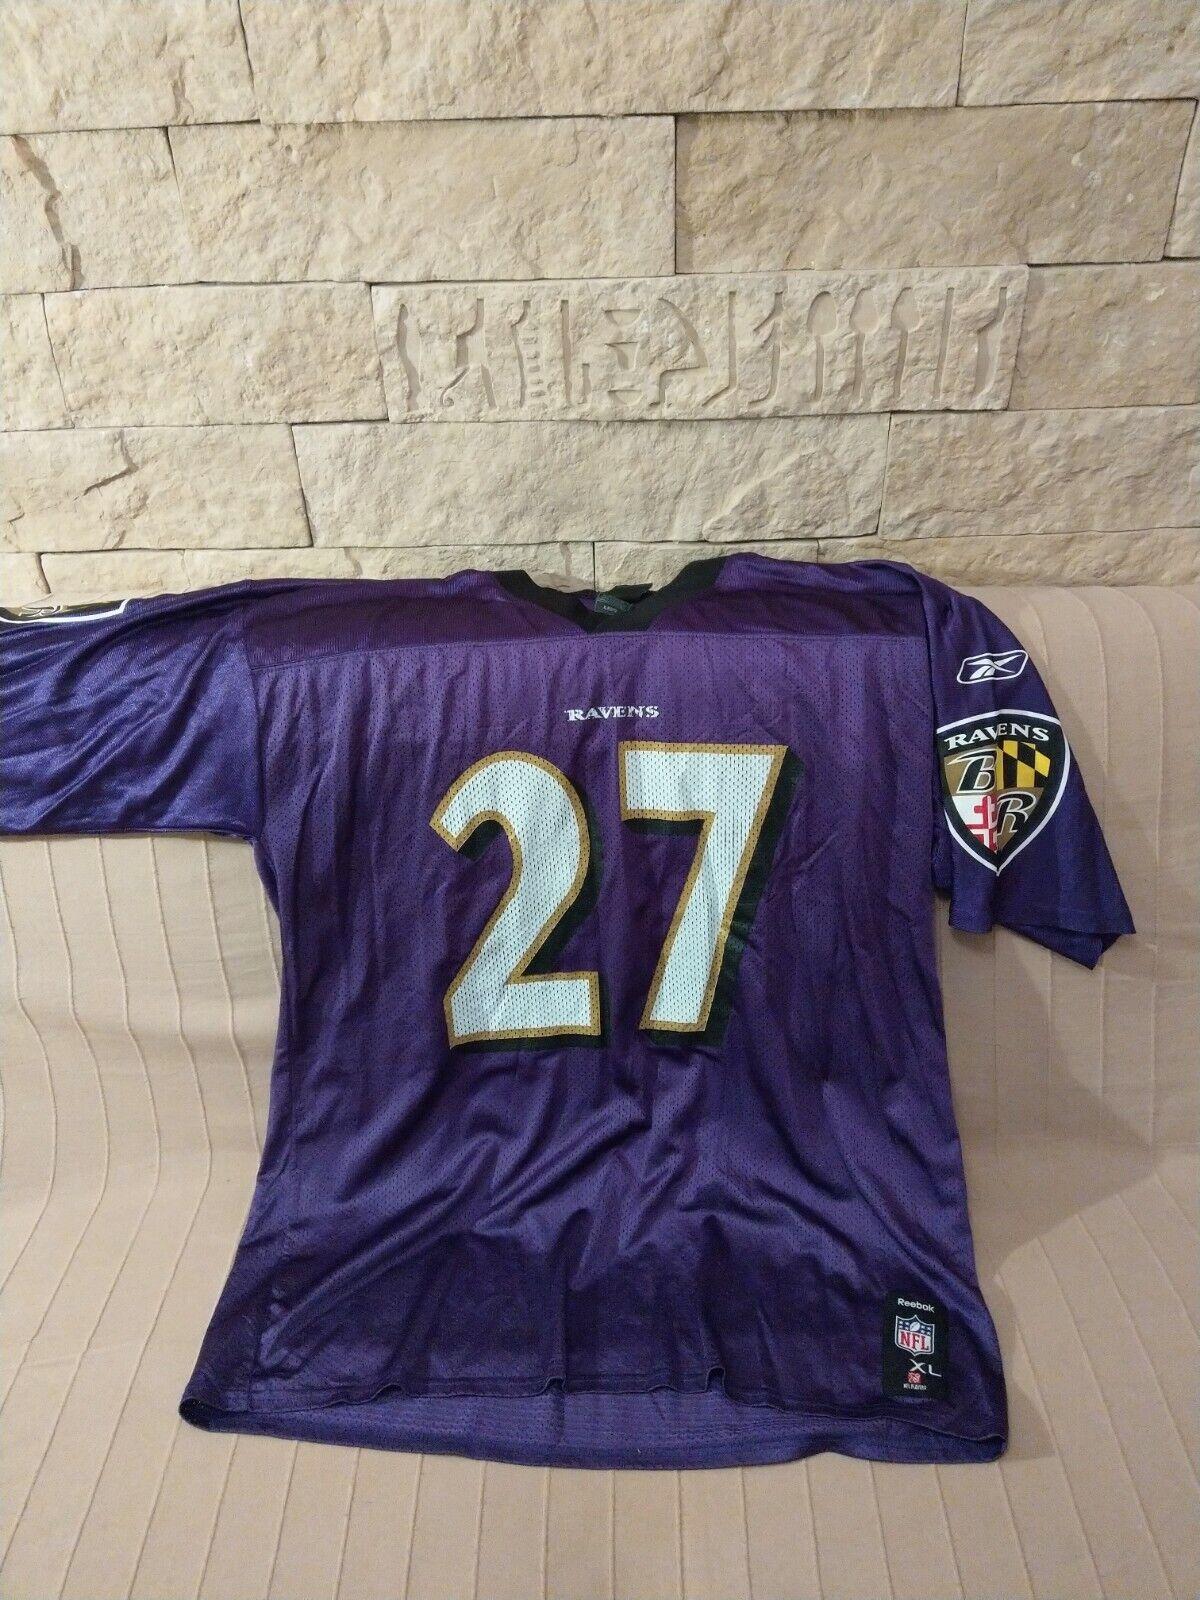 Baltimore Ravens NFL Rice trikot jersey Gr XL Reebok